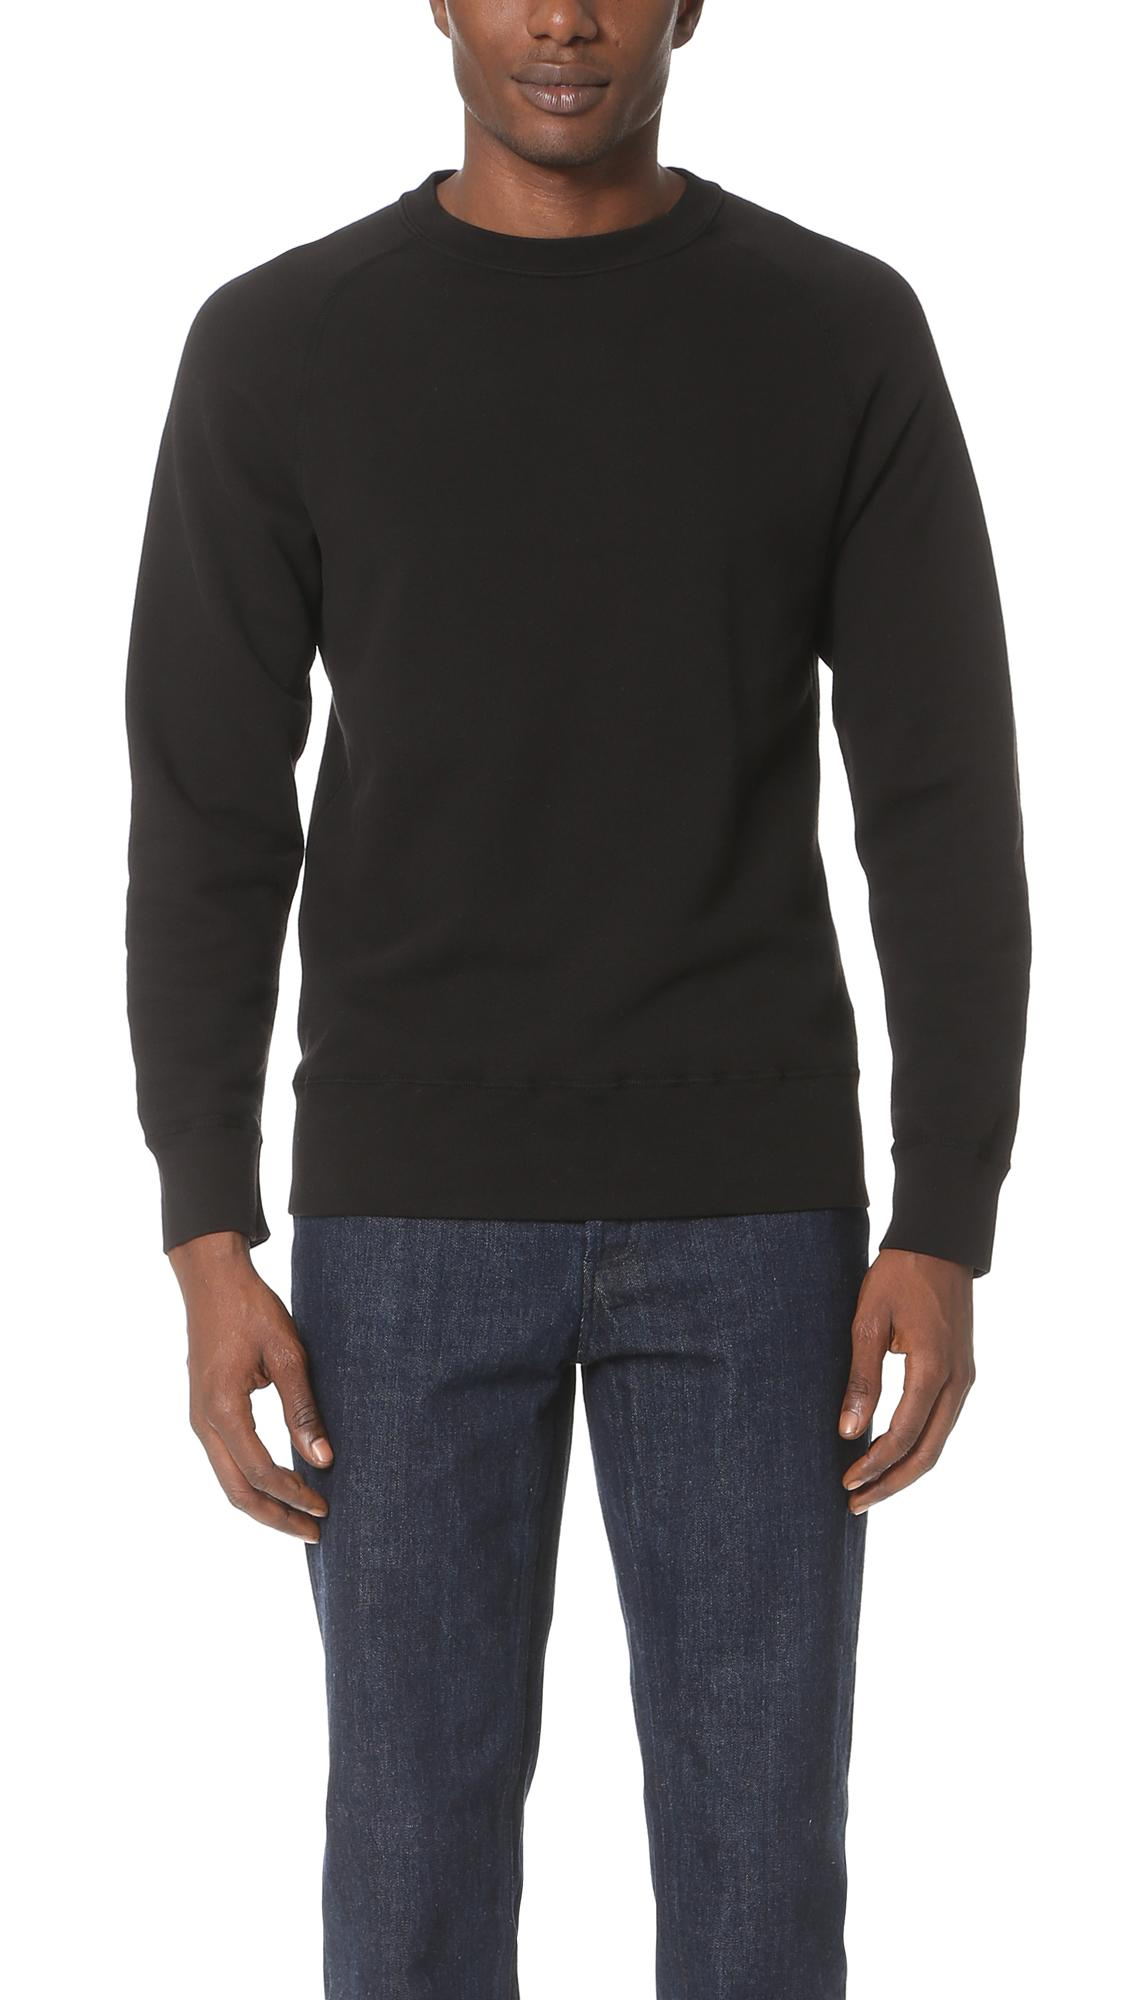 e188686260 Velva Sheen Crew Neck Sweatshirt In Heather Grey | ModeSens